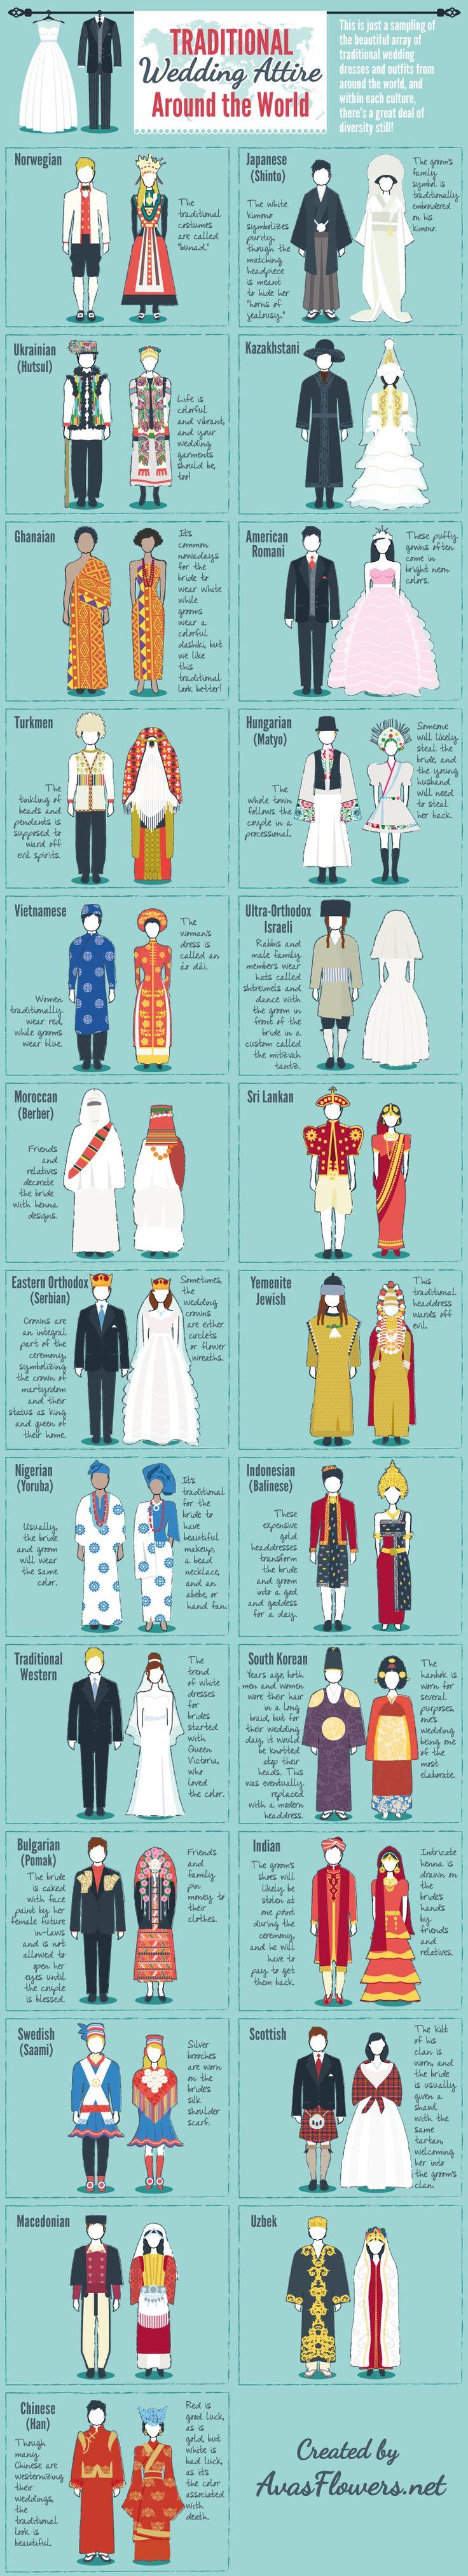 Traditional wedding attire around the world [INFOGRAPHIC] - Matador Network